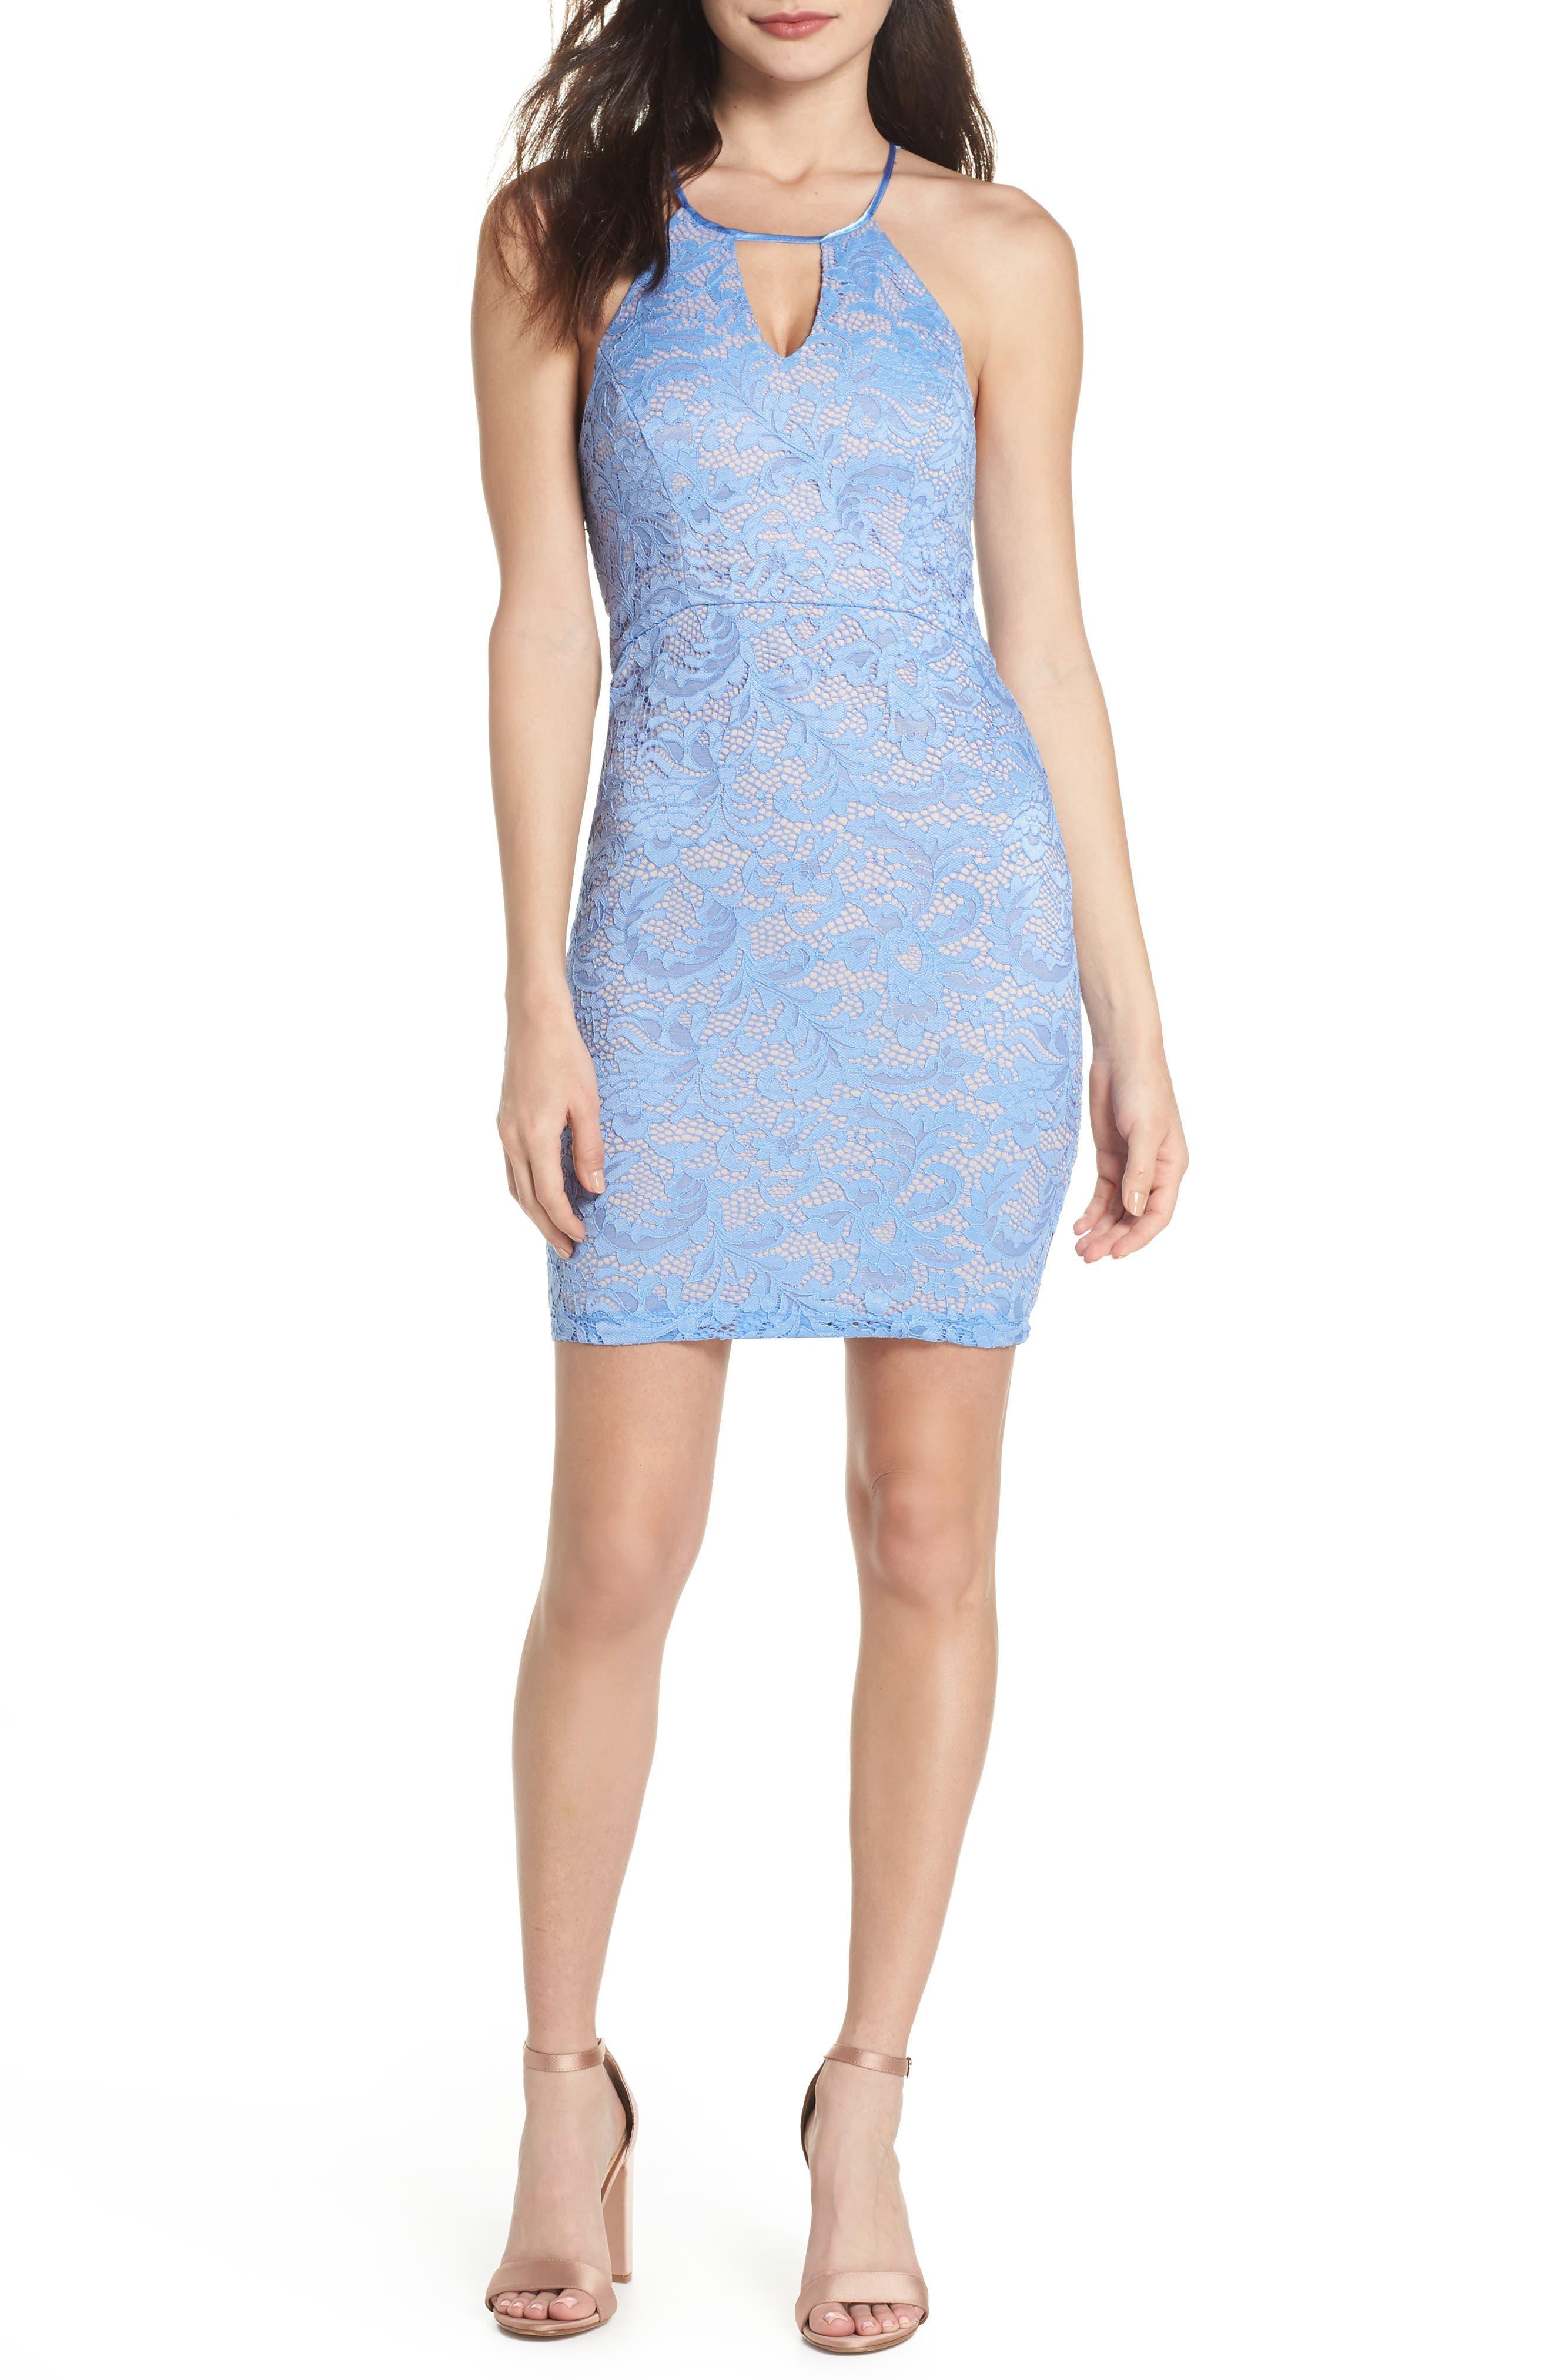 Sequin Hearts Racerback Lace Halter Dress